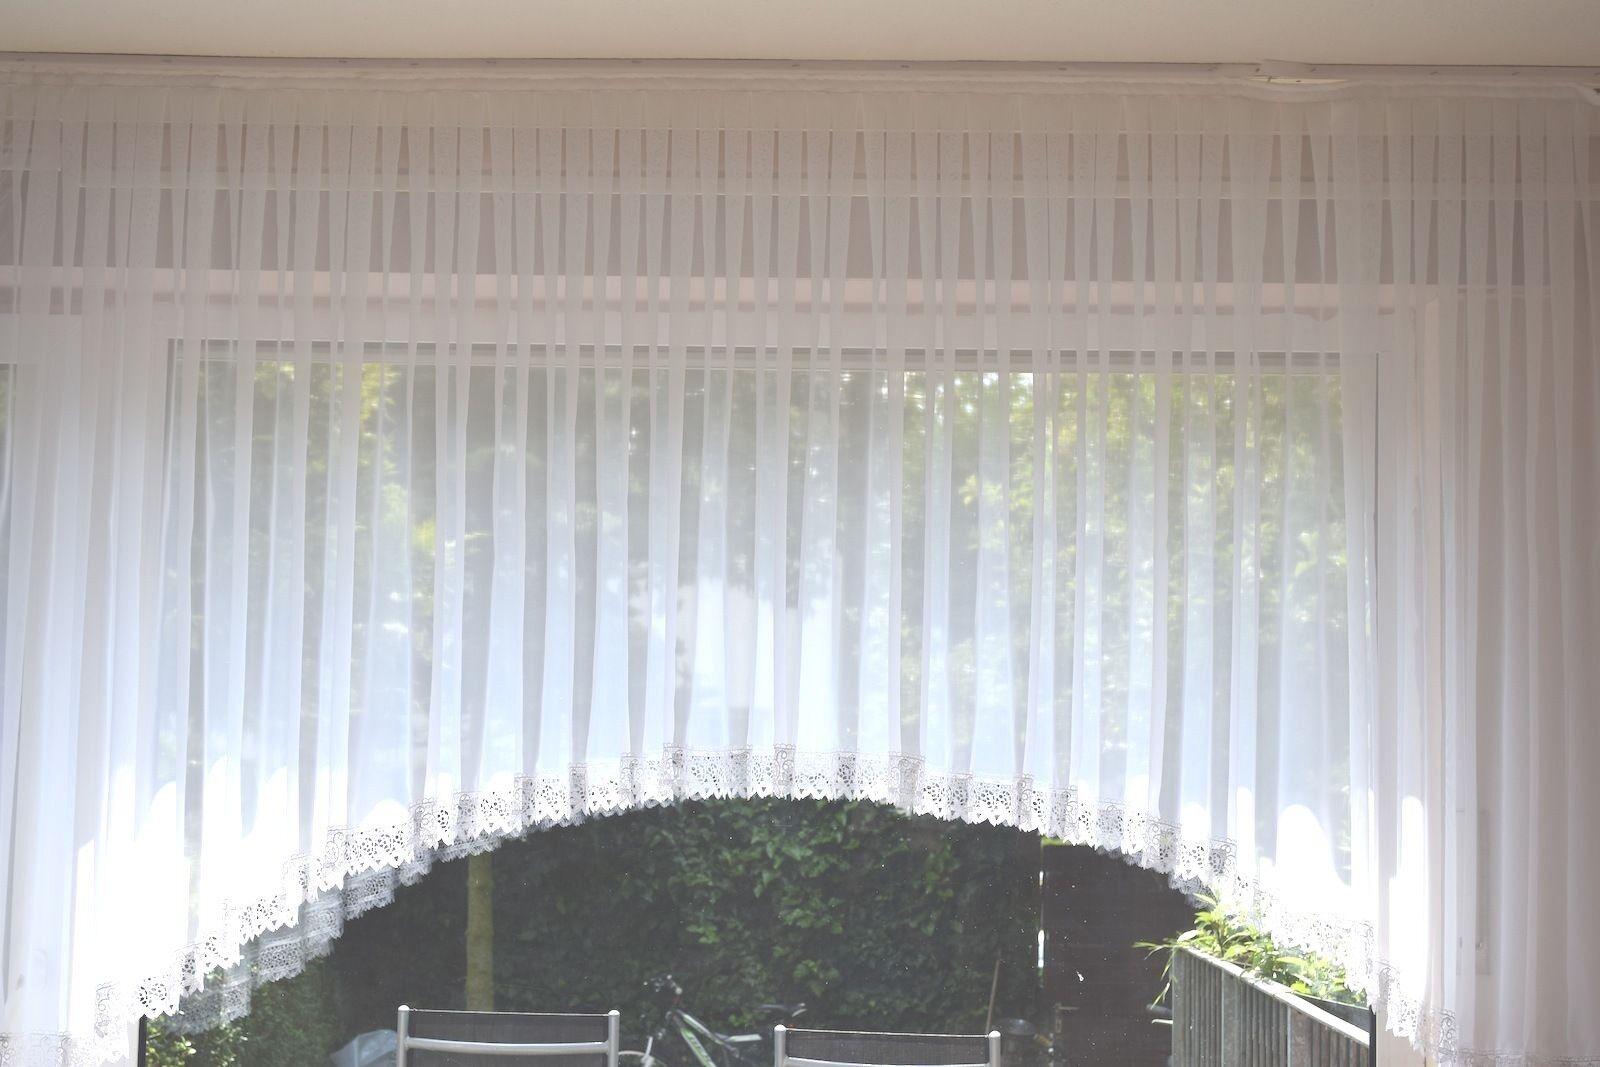 C-Bogen Store Gardine Landhaus azulmenfenster Uni Voile Makrame Spitze Borte 8cm